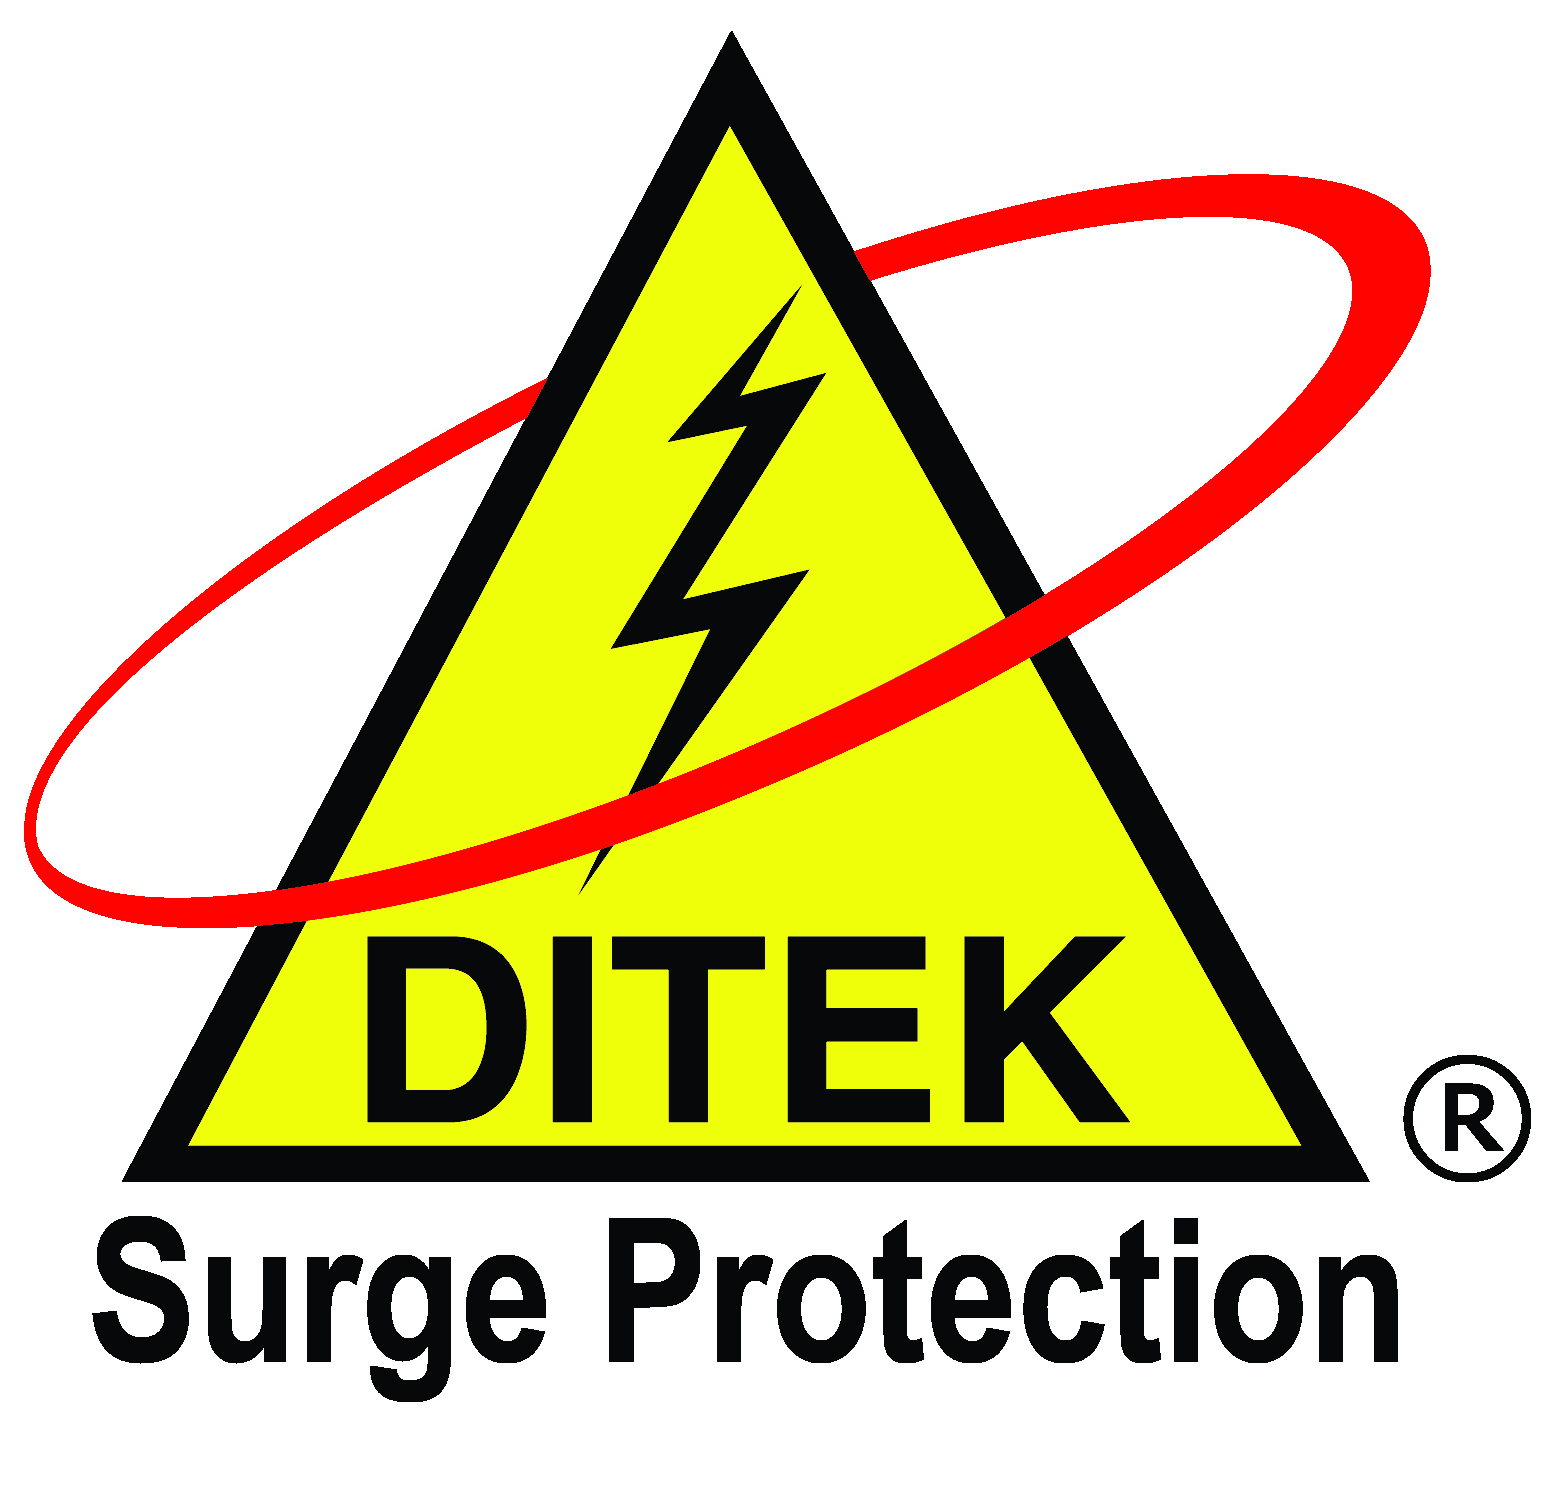 DITEK logo